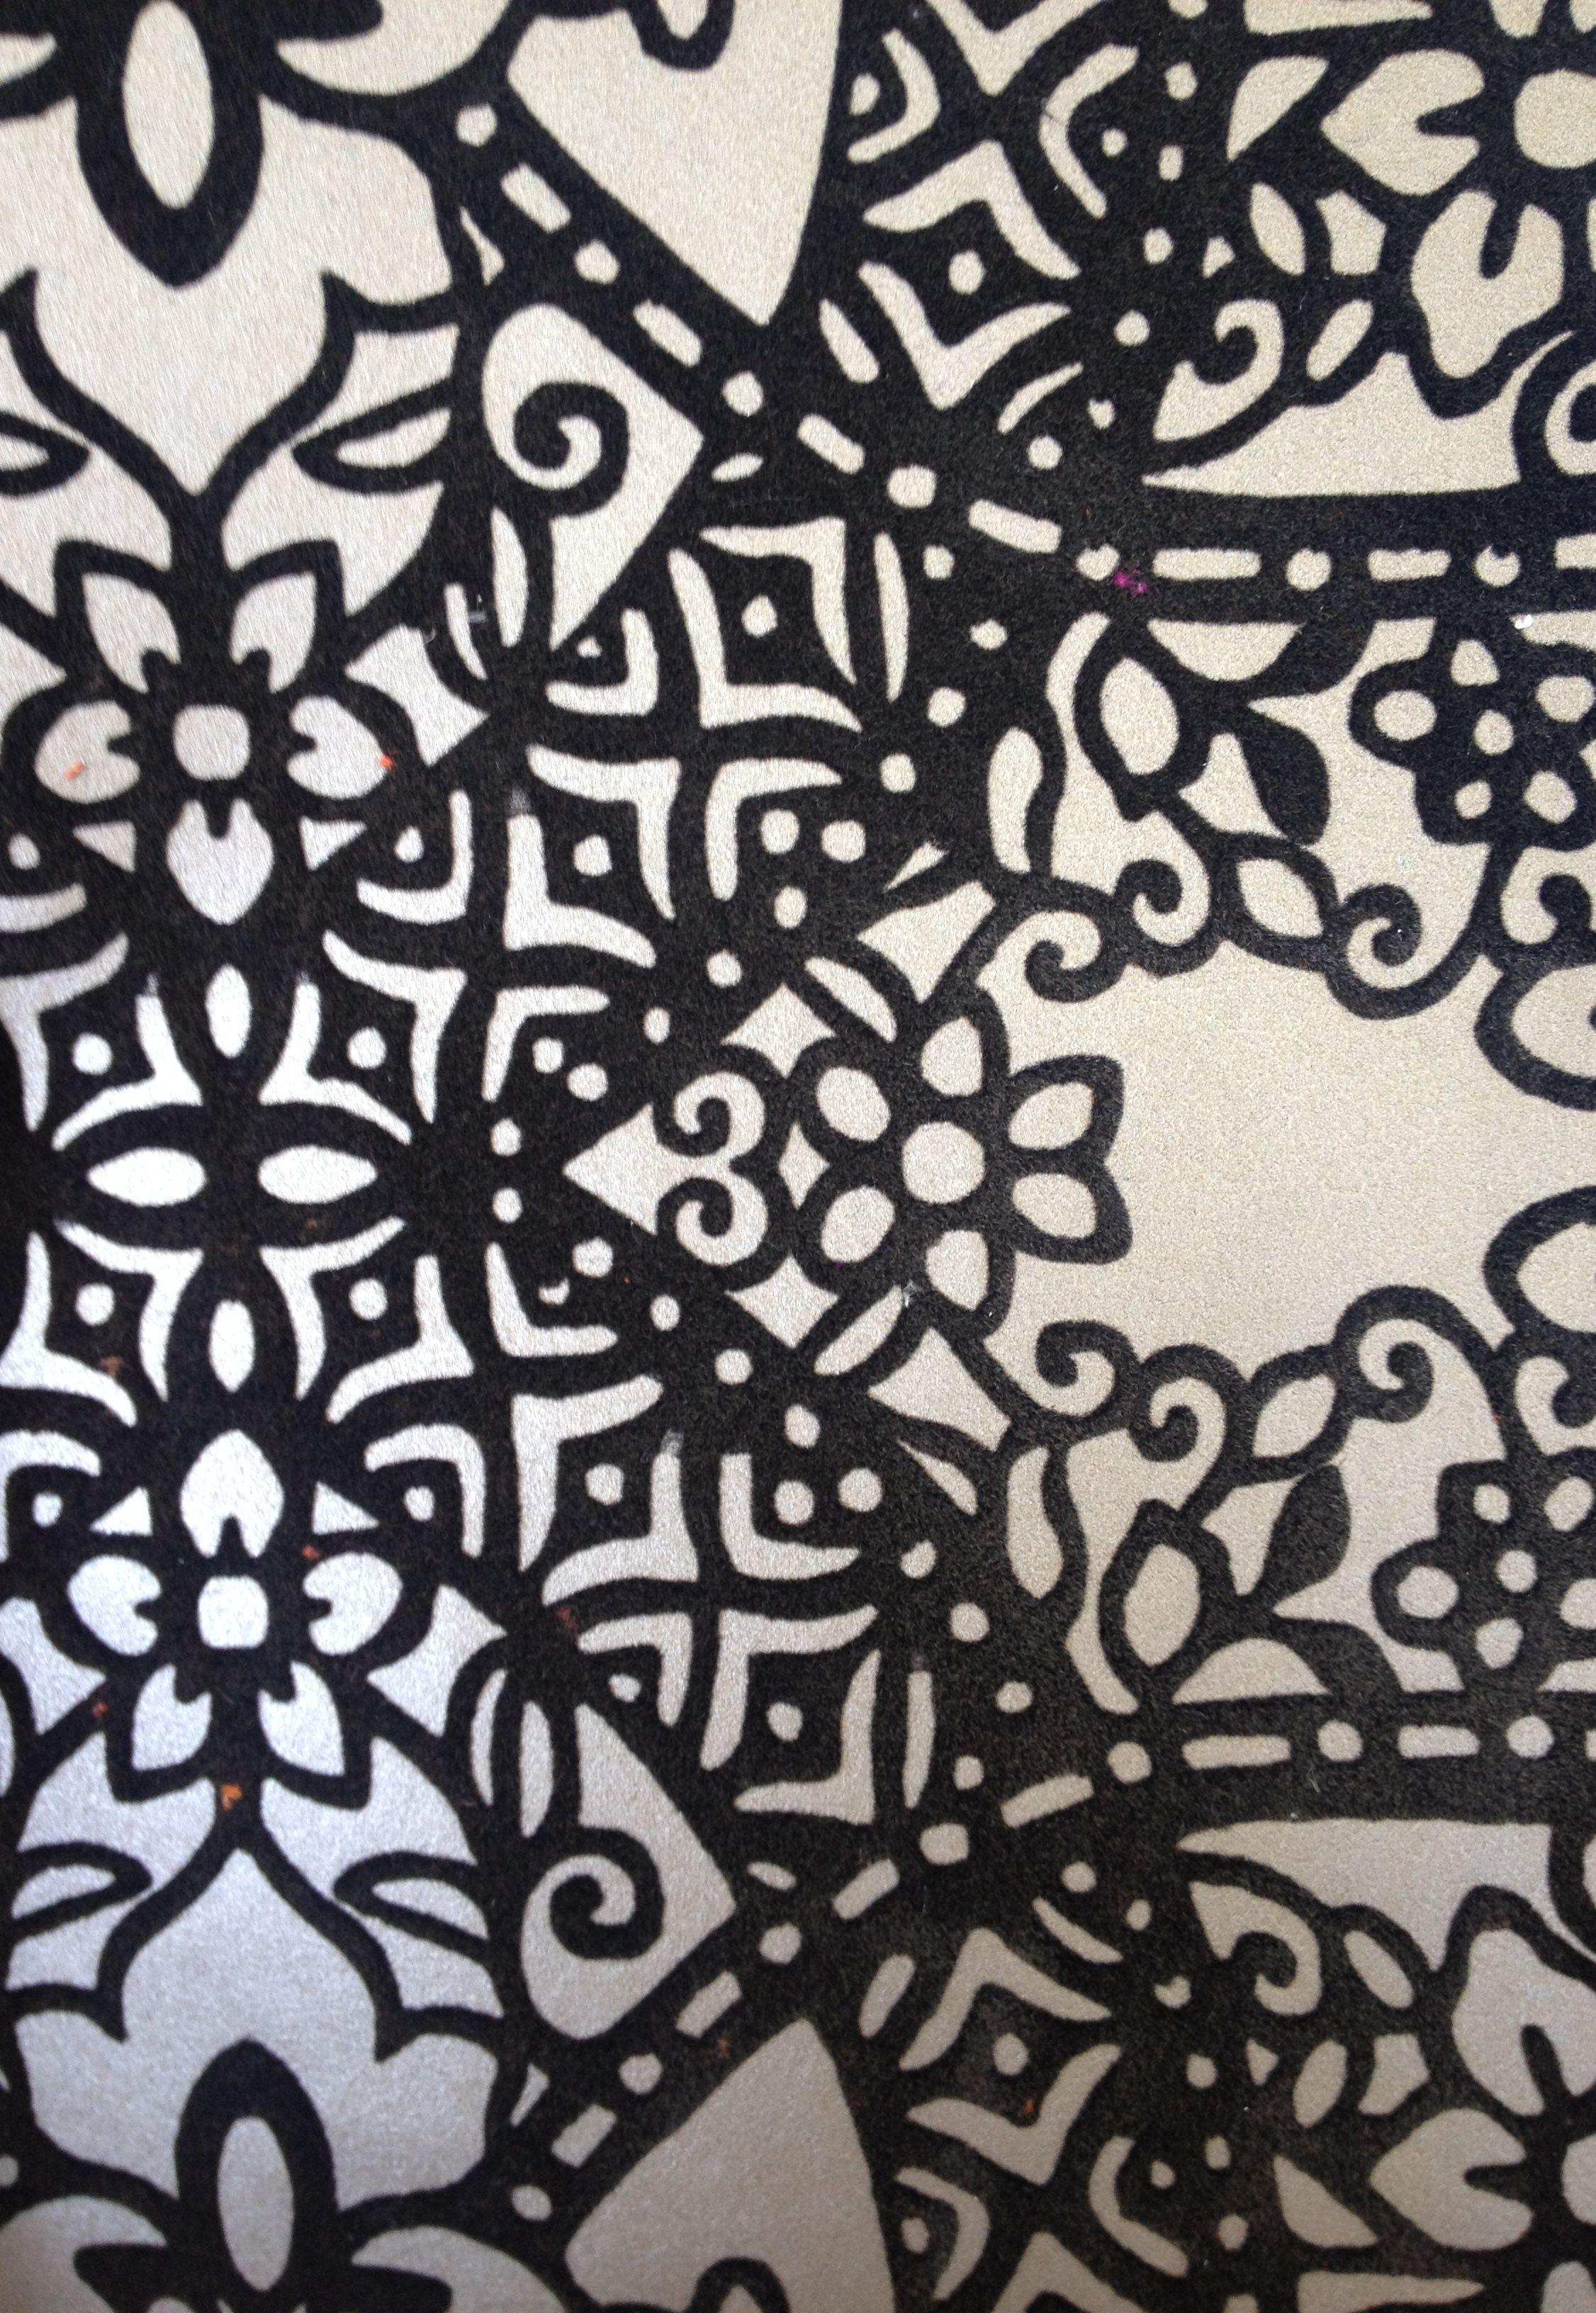 ROMO Black Edition Byzantine Flock Wallcovering Charcoal W364 02